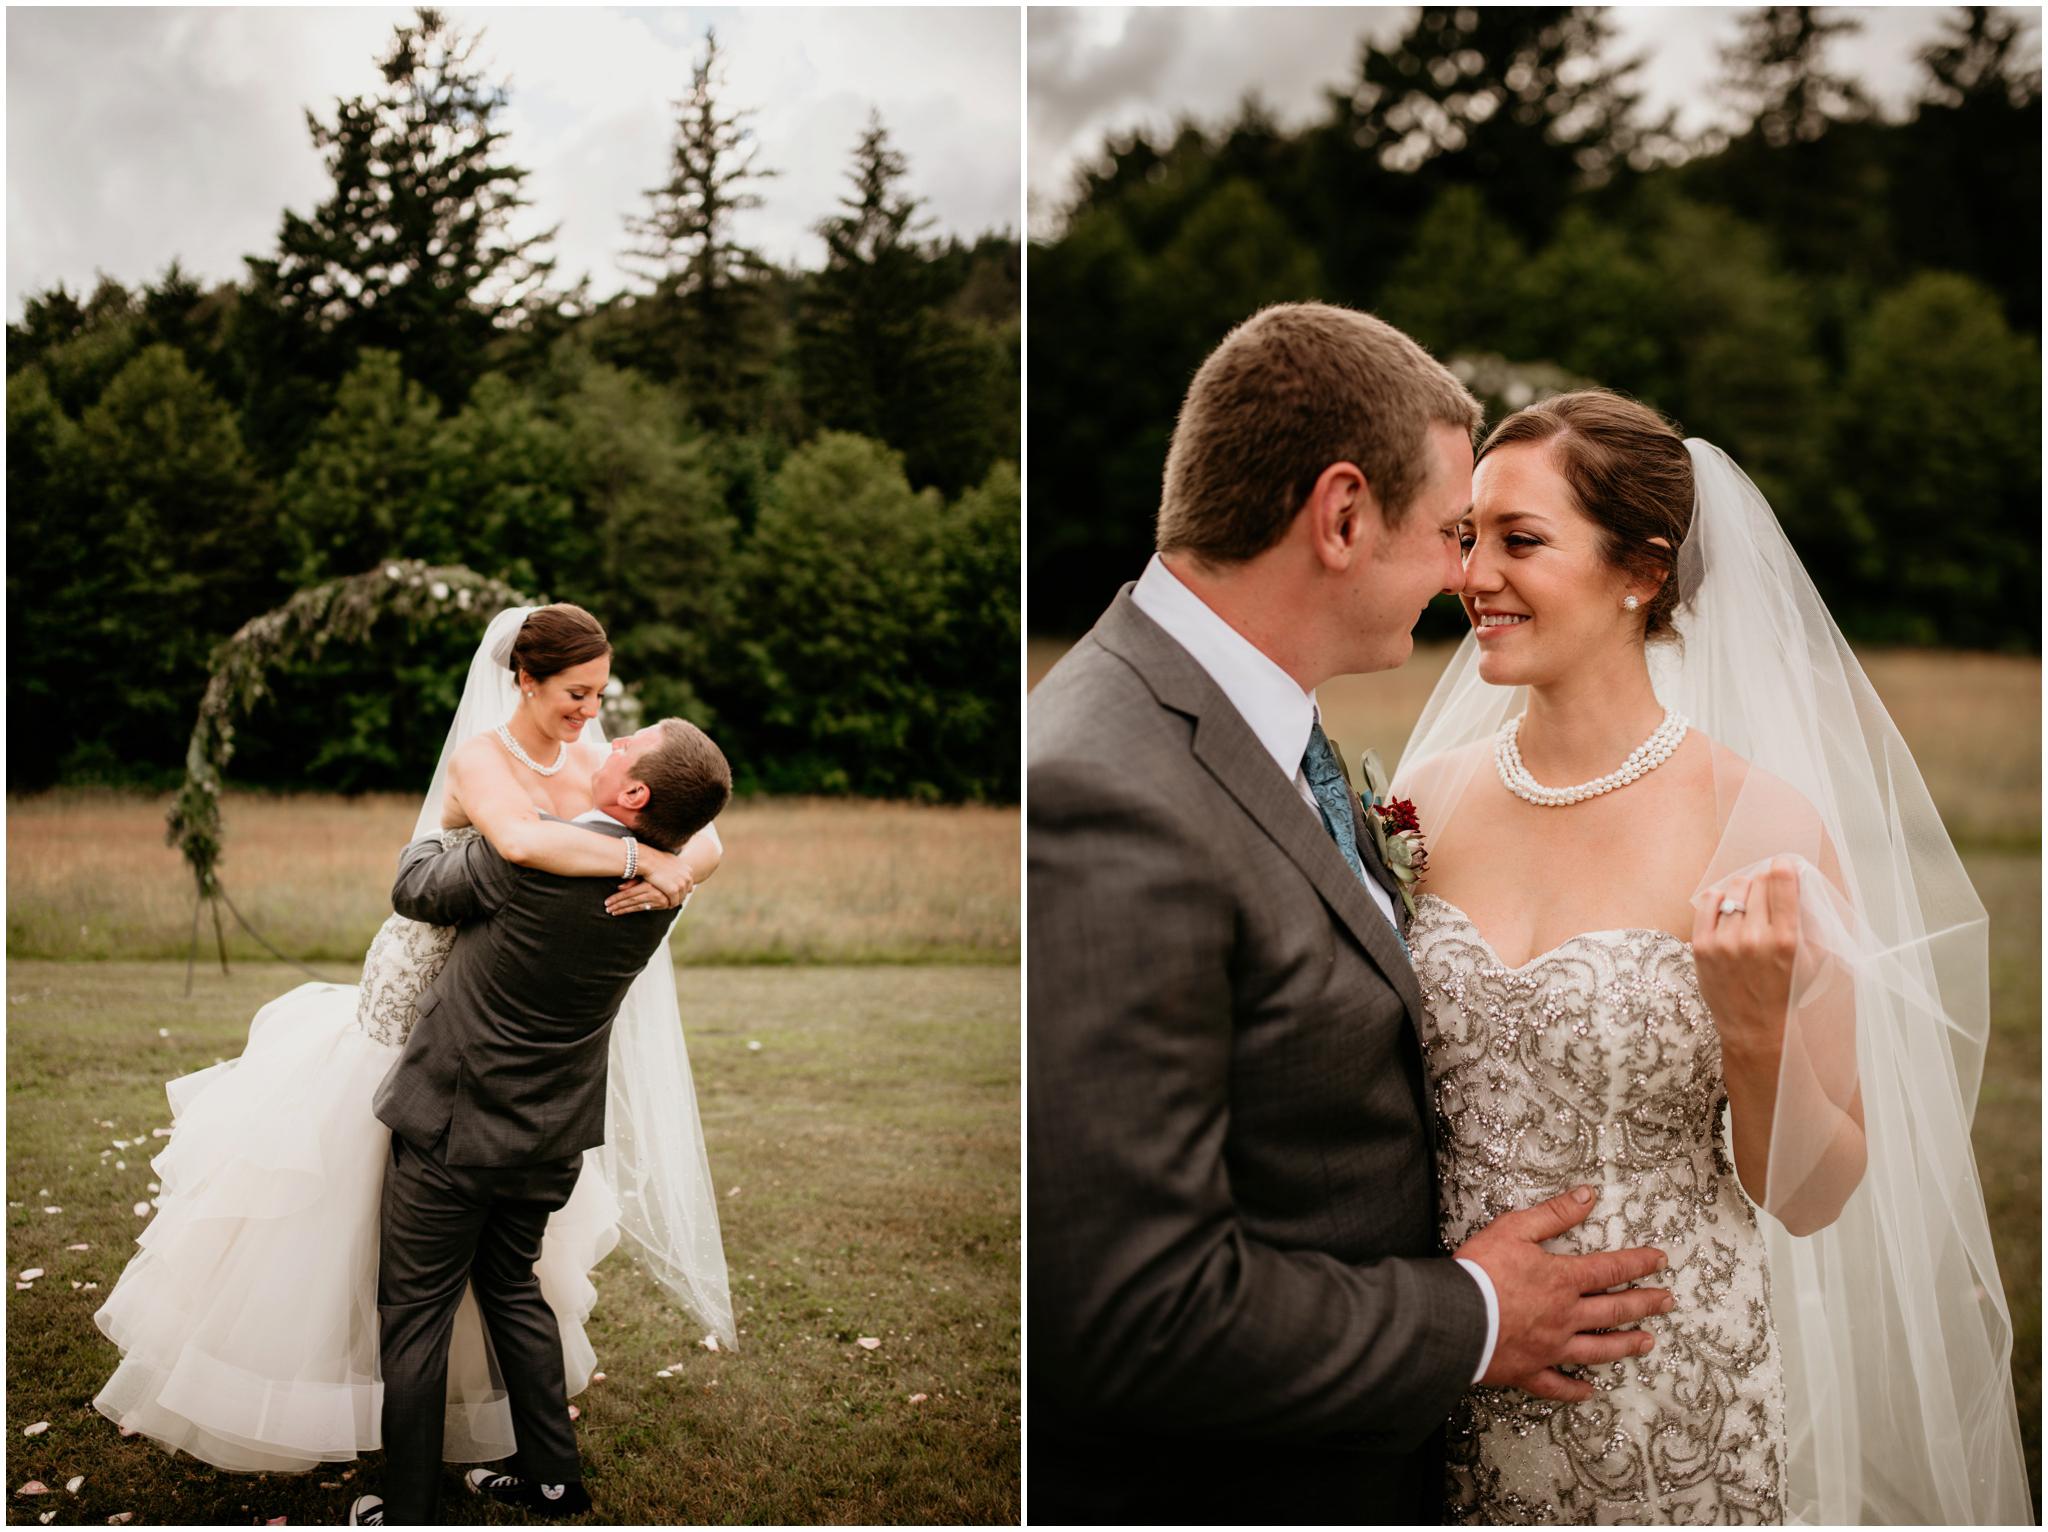 alex-and-matthew-three-cs-farm-venue-seattle-wedding-photographer-147.jpg